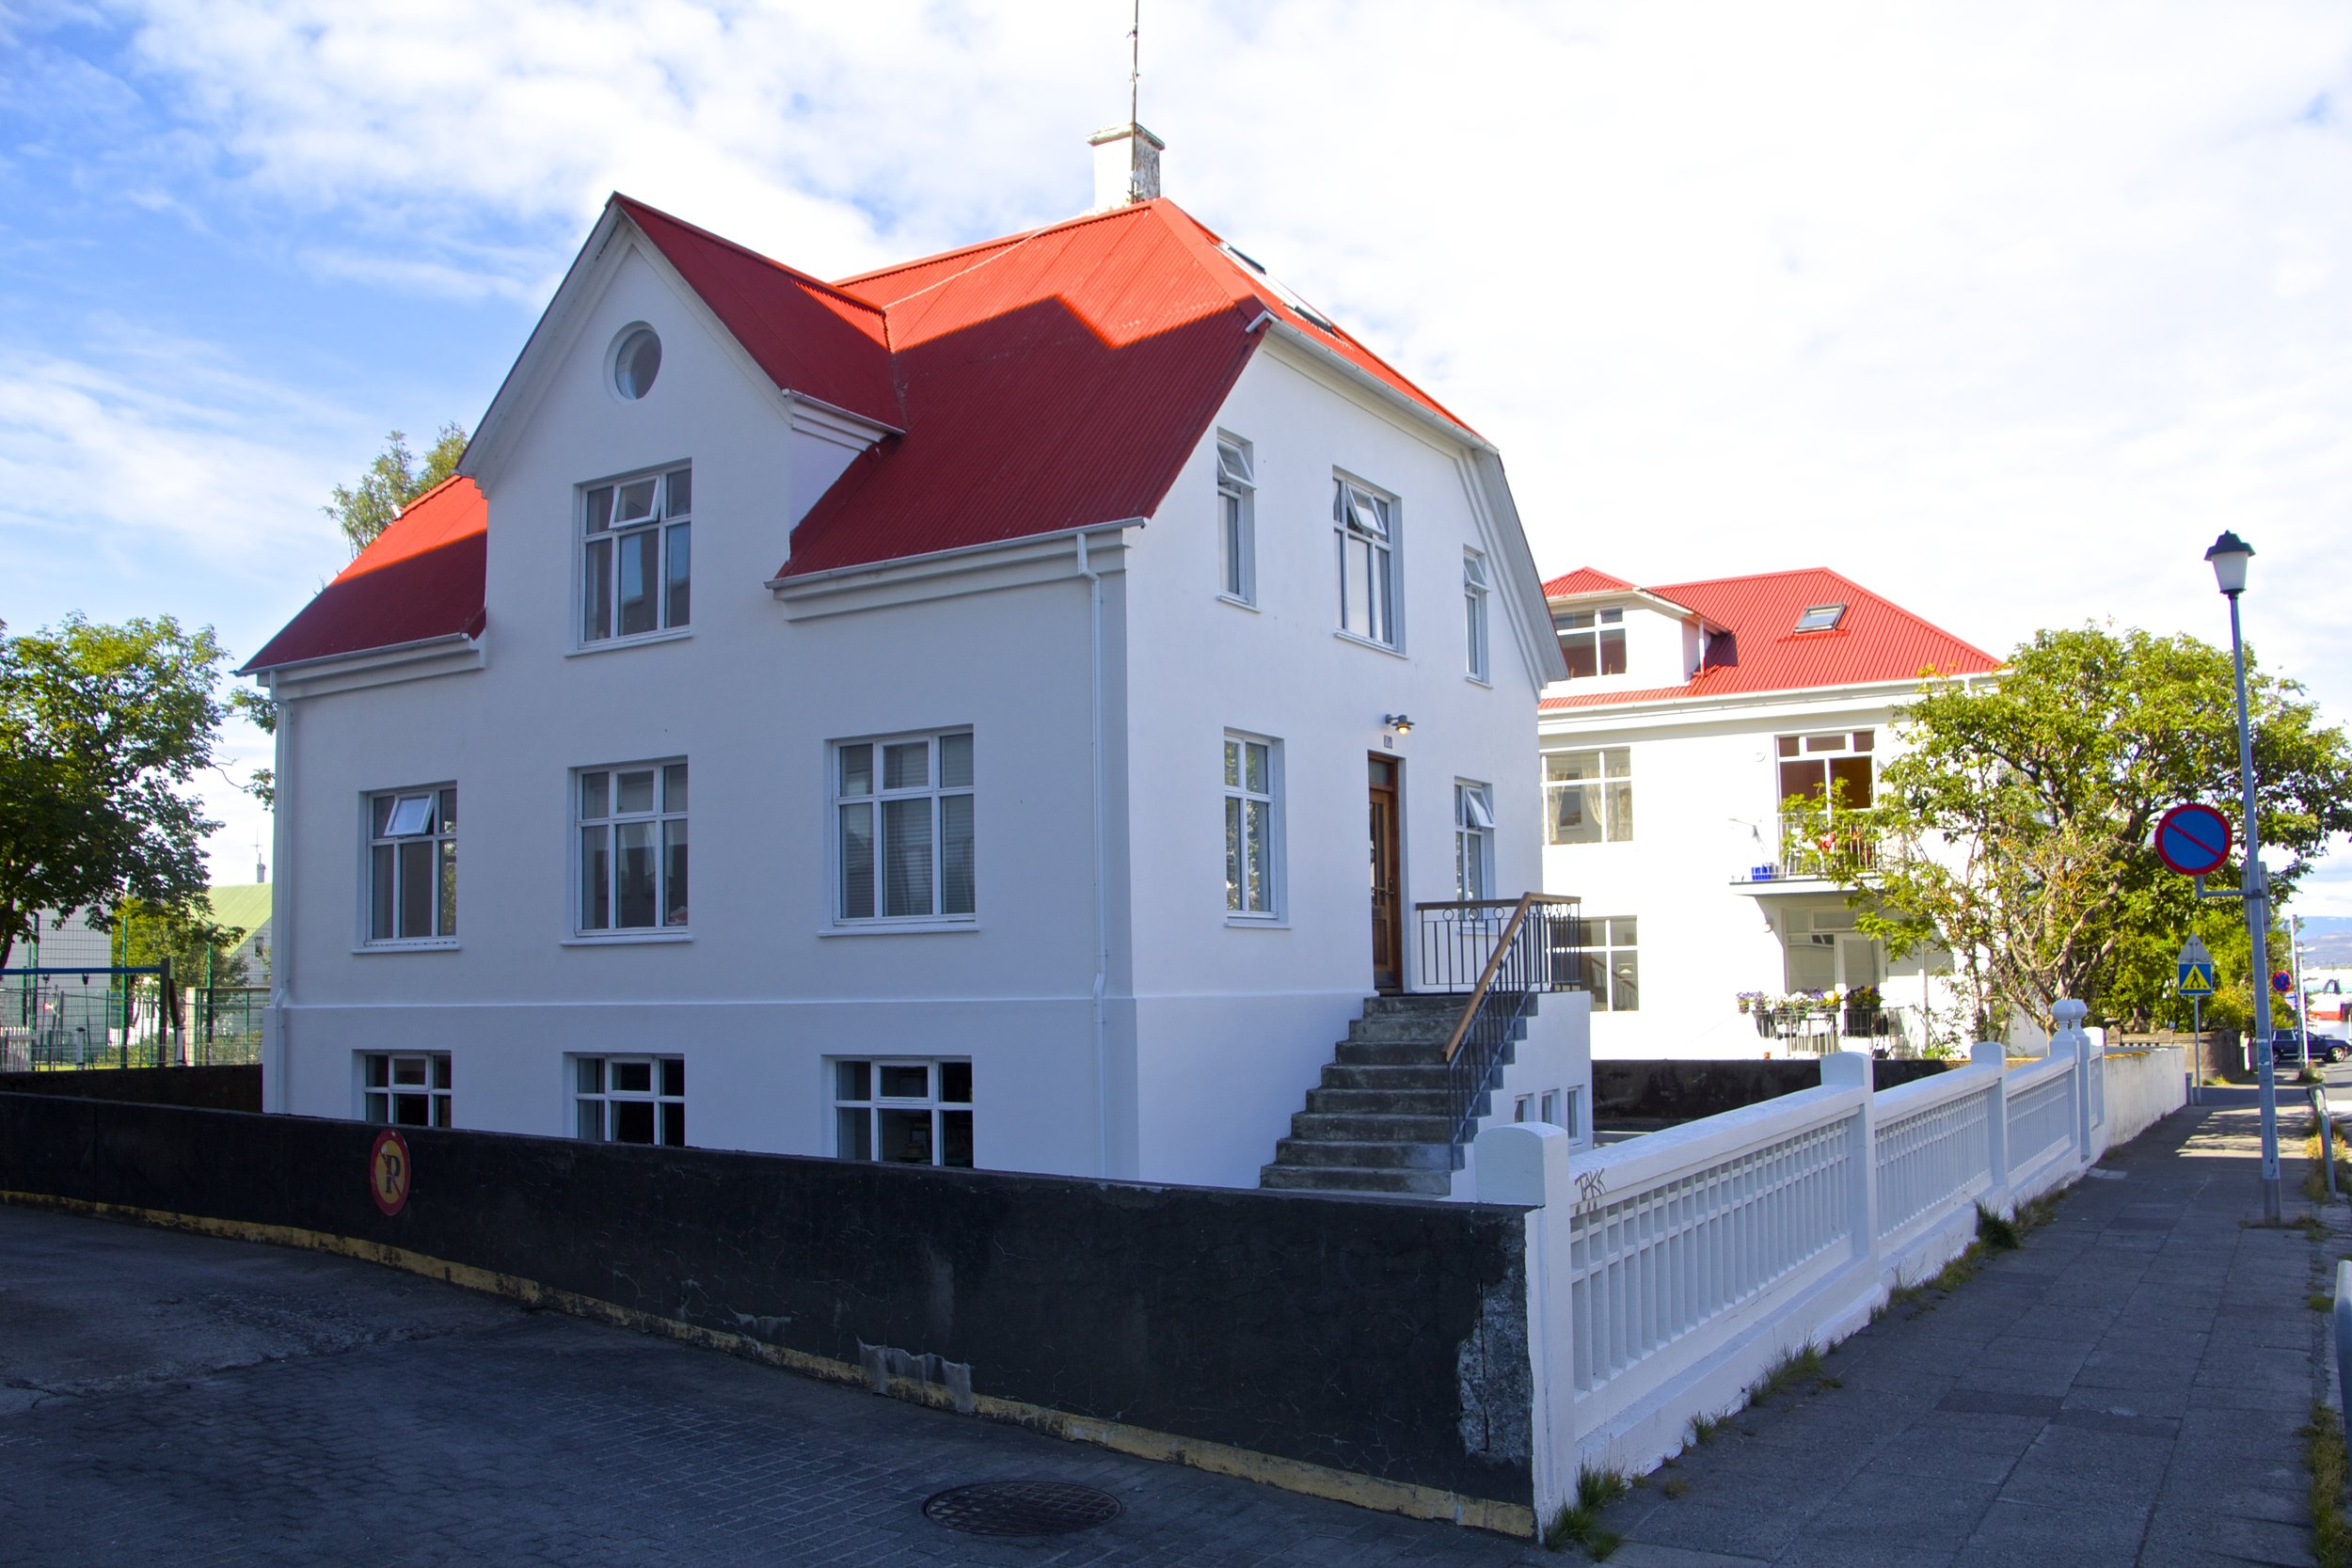 reykjavík iceland 15.jpg